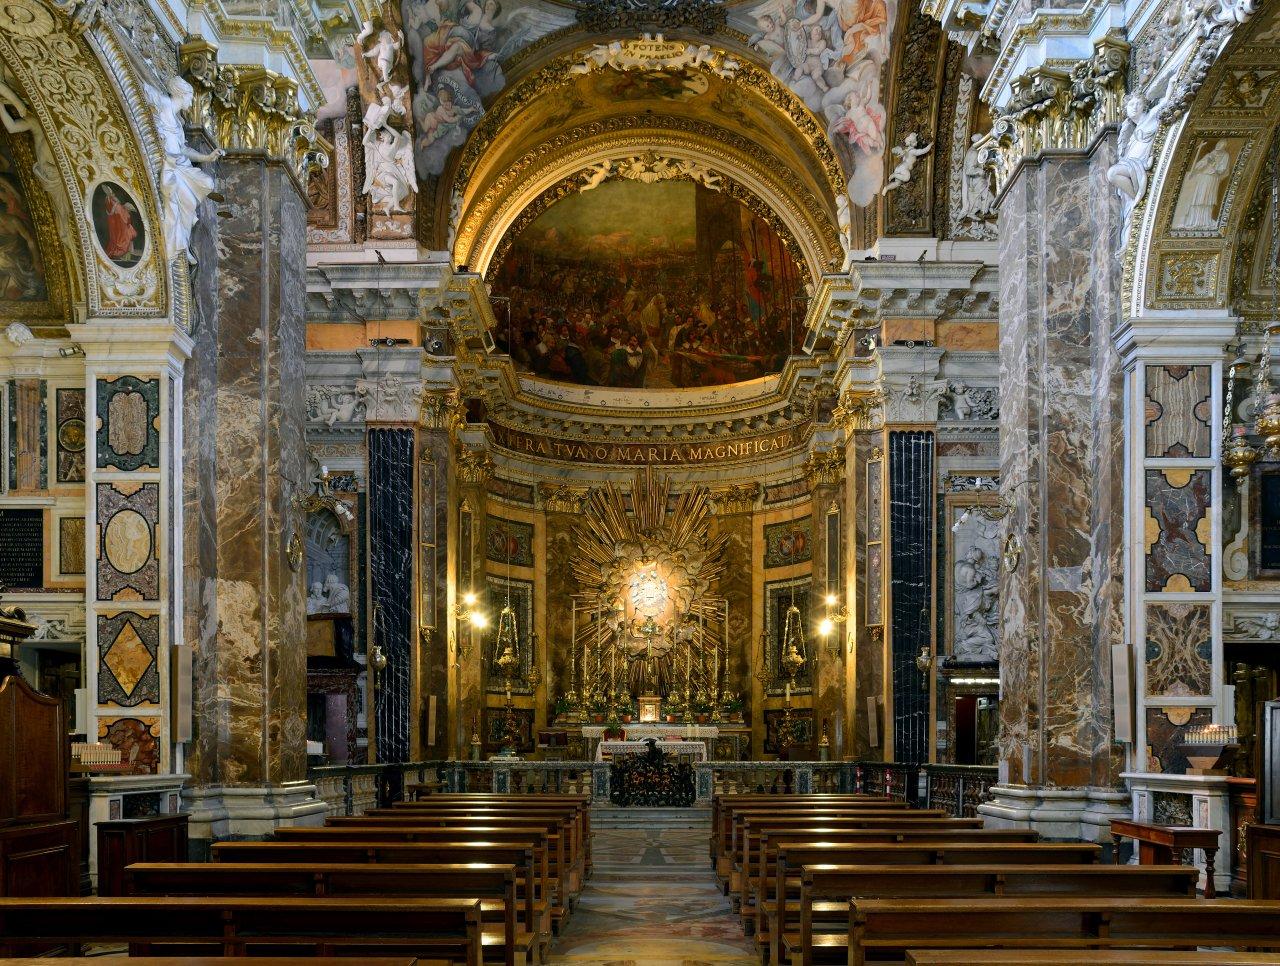 Santa Maria della Vittoria, Rome Attractions, Best Places to visit in Rome, Italy